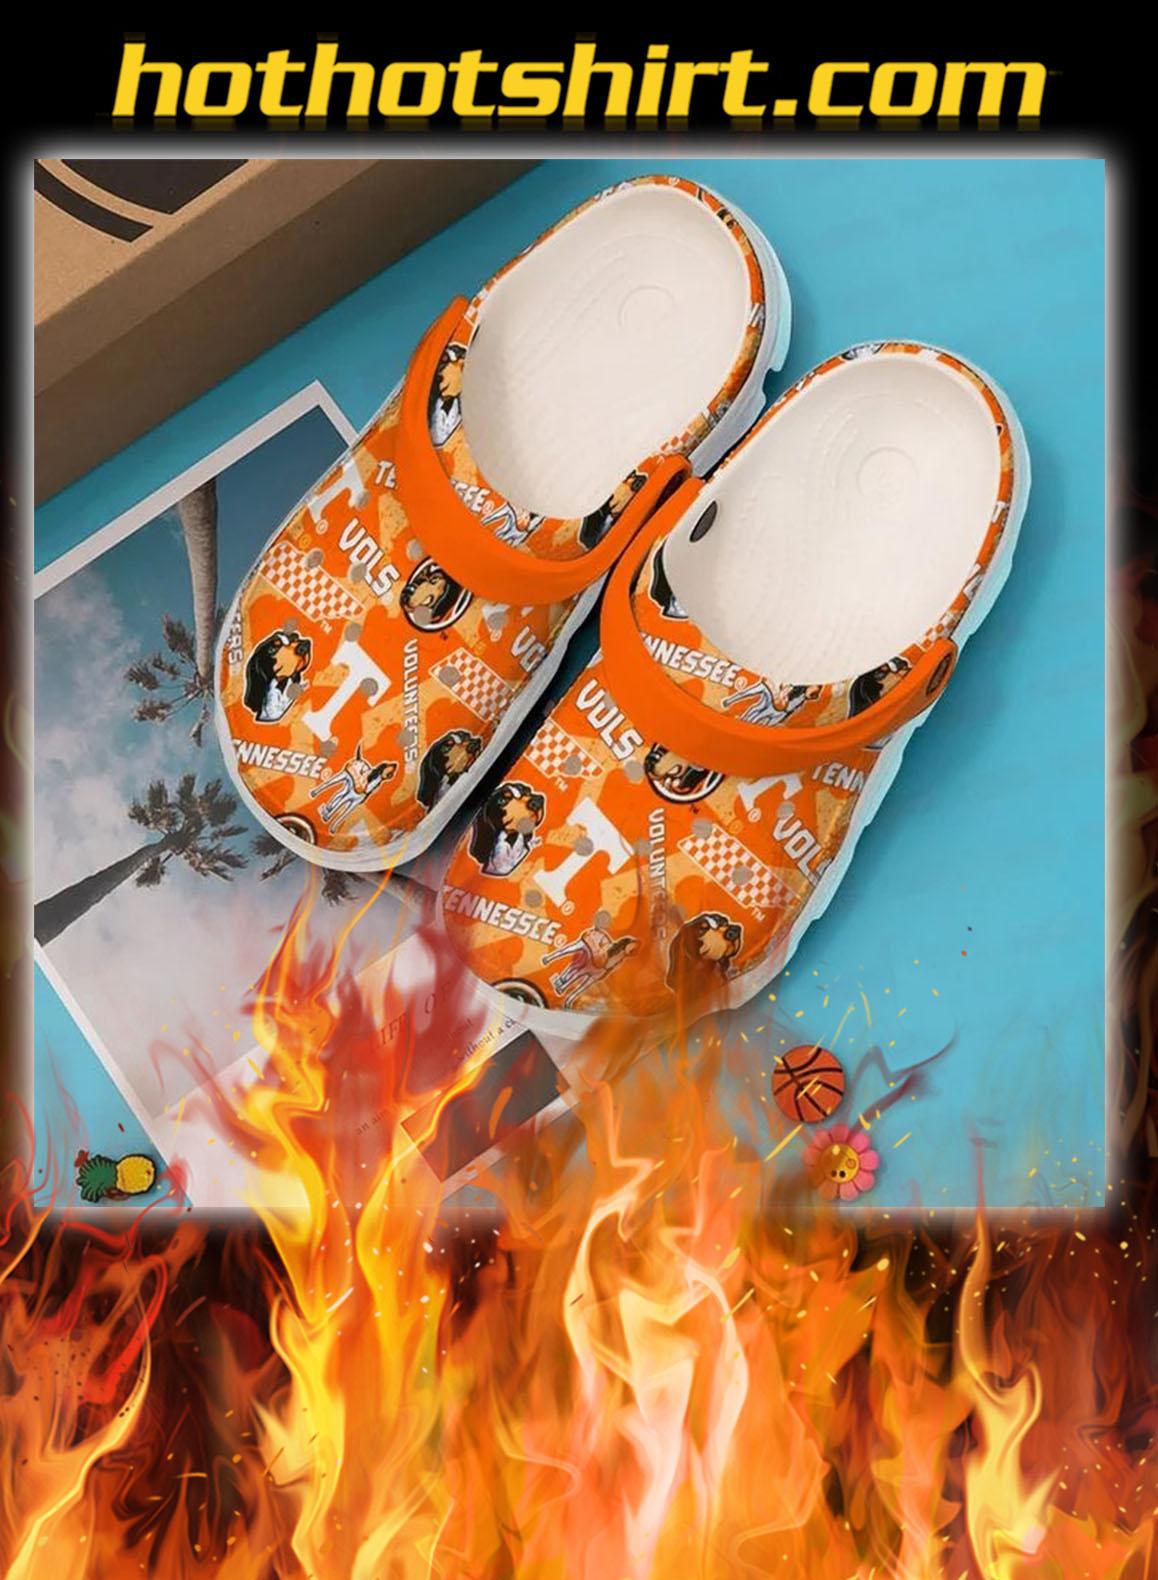 Tennessee volunteers football crocband crocs shoes- pic 1